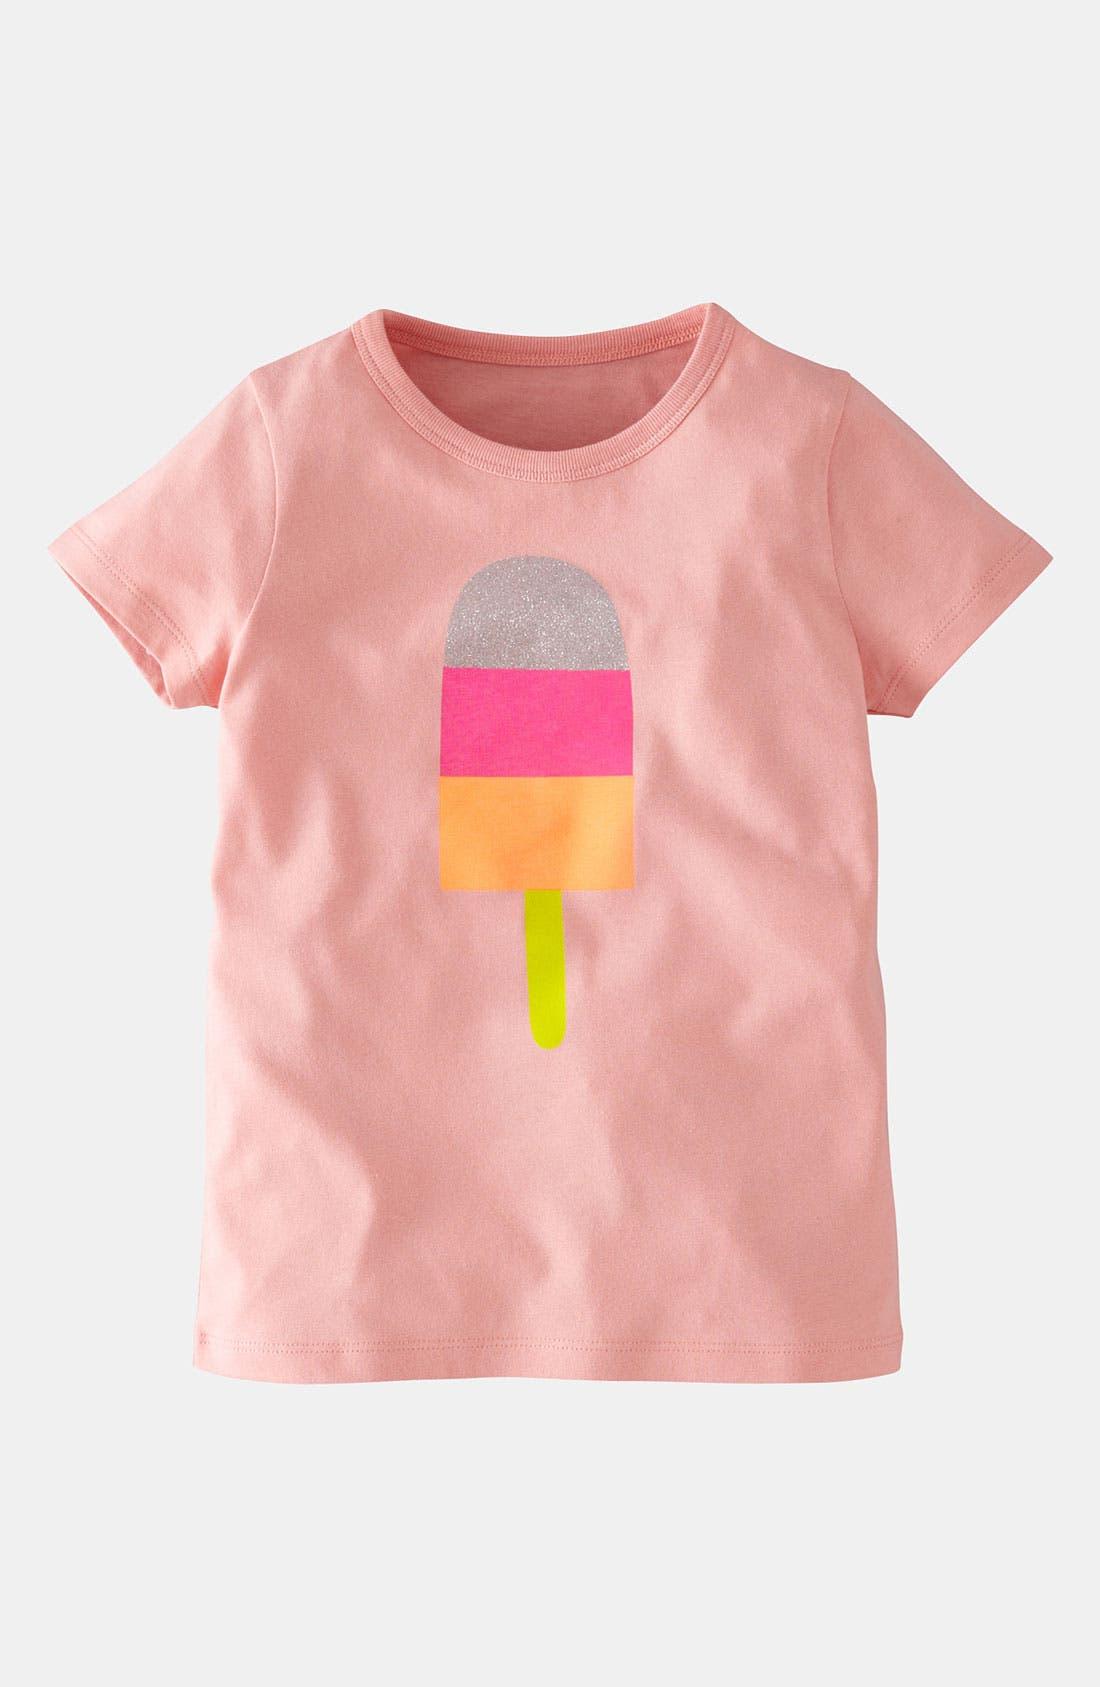 Alternate Image 1 Selected - Mini Boden 'Glittery' Graphic Tee (Little Girls & Big Girls)